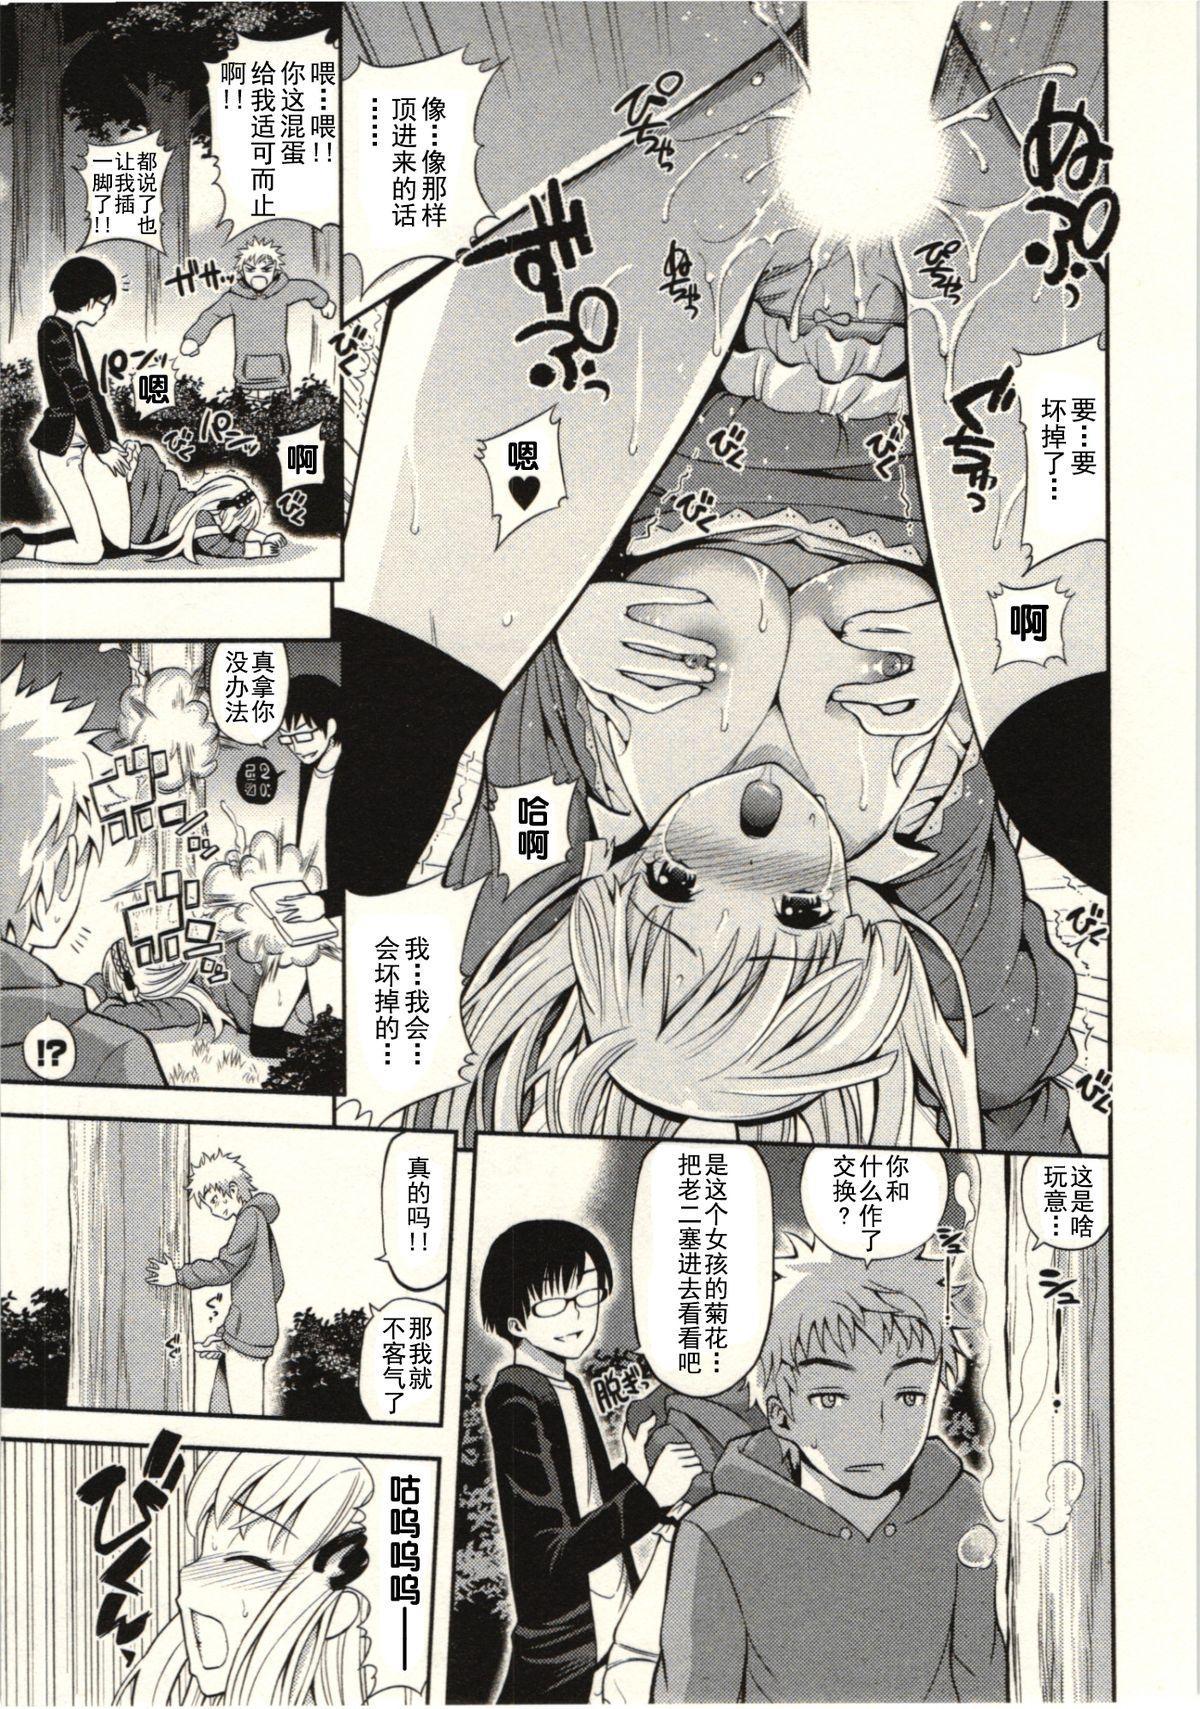 Tadashii Majutsu no Asobikata - The right way of playing of magic. 139